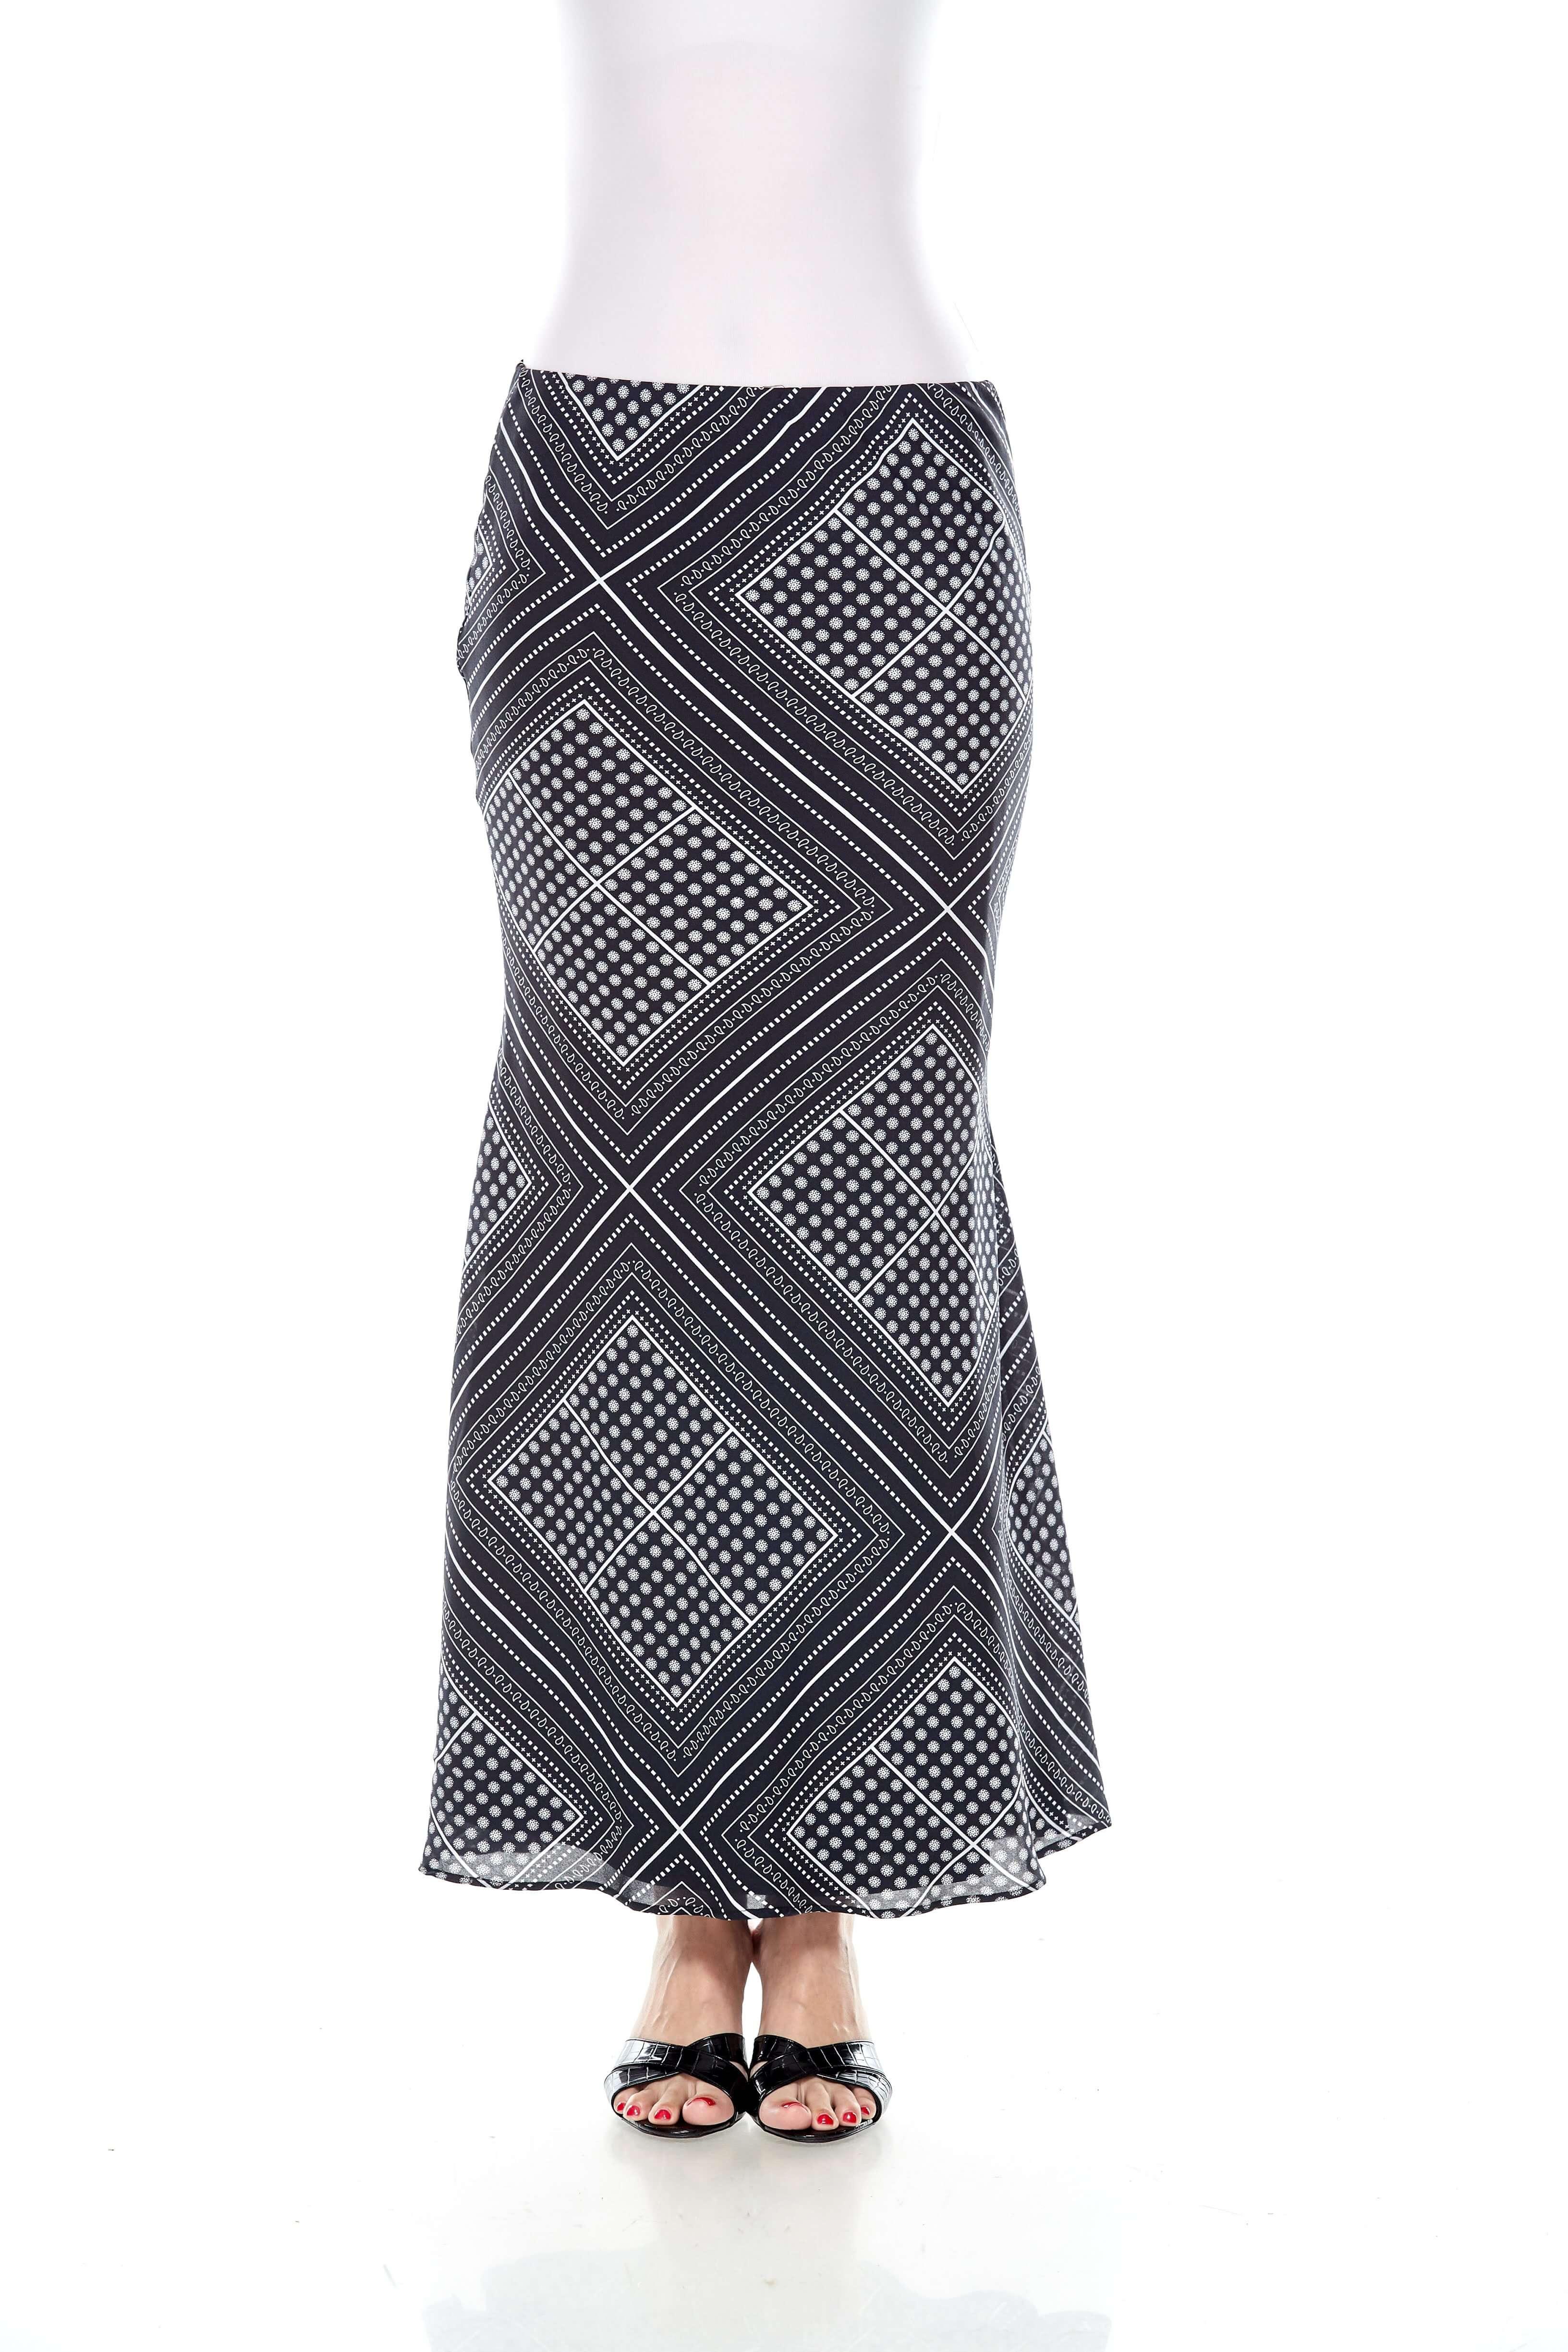 Black Handkerchief Print Mermaid Skirt (2)